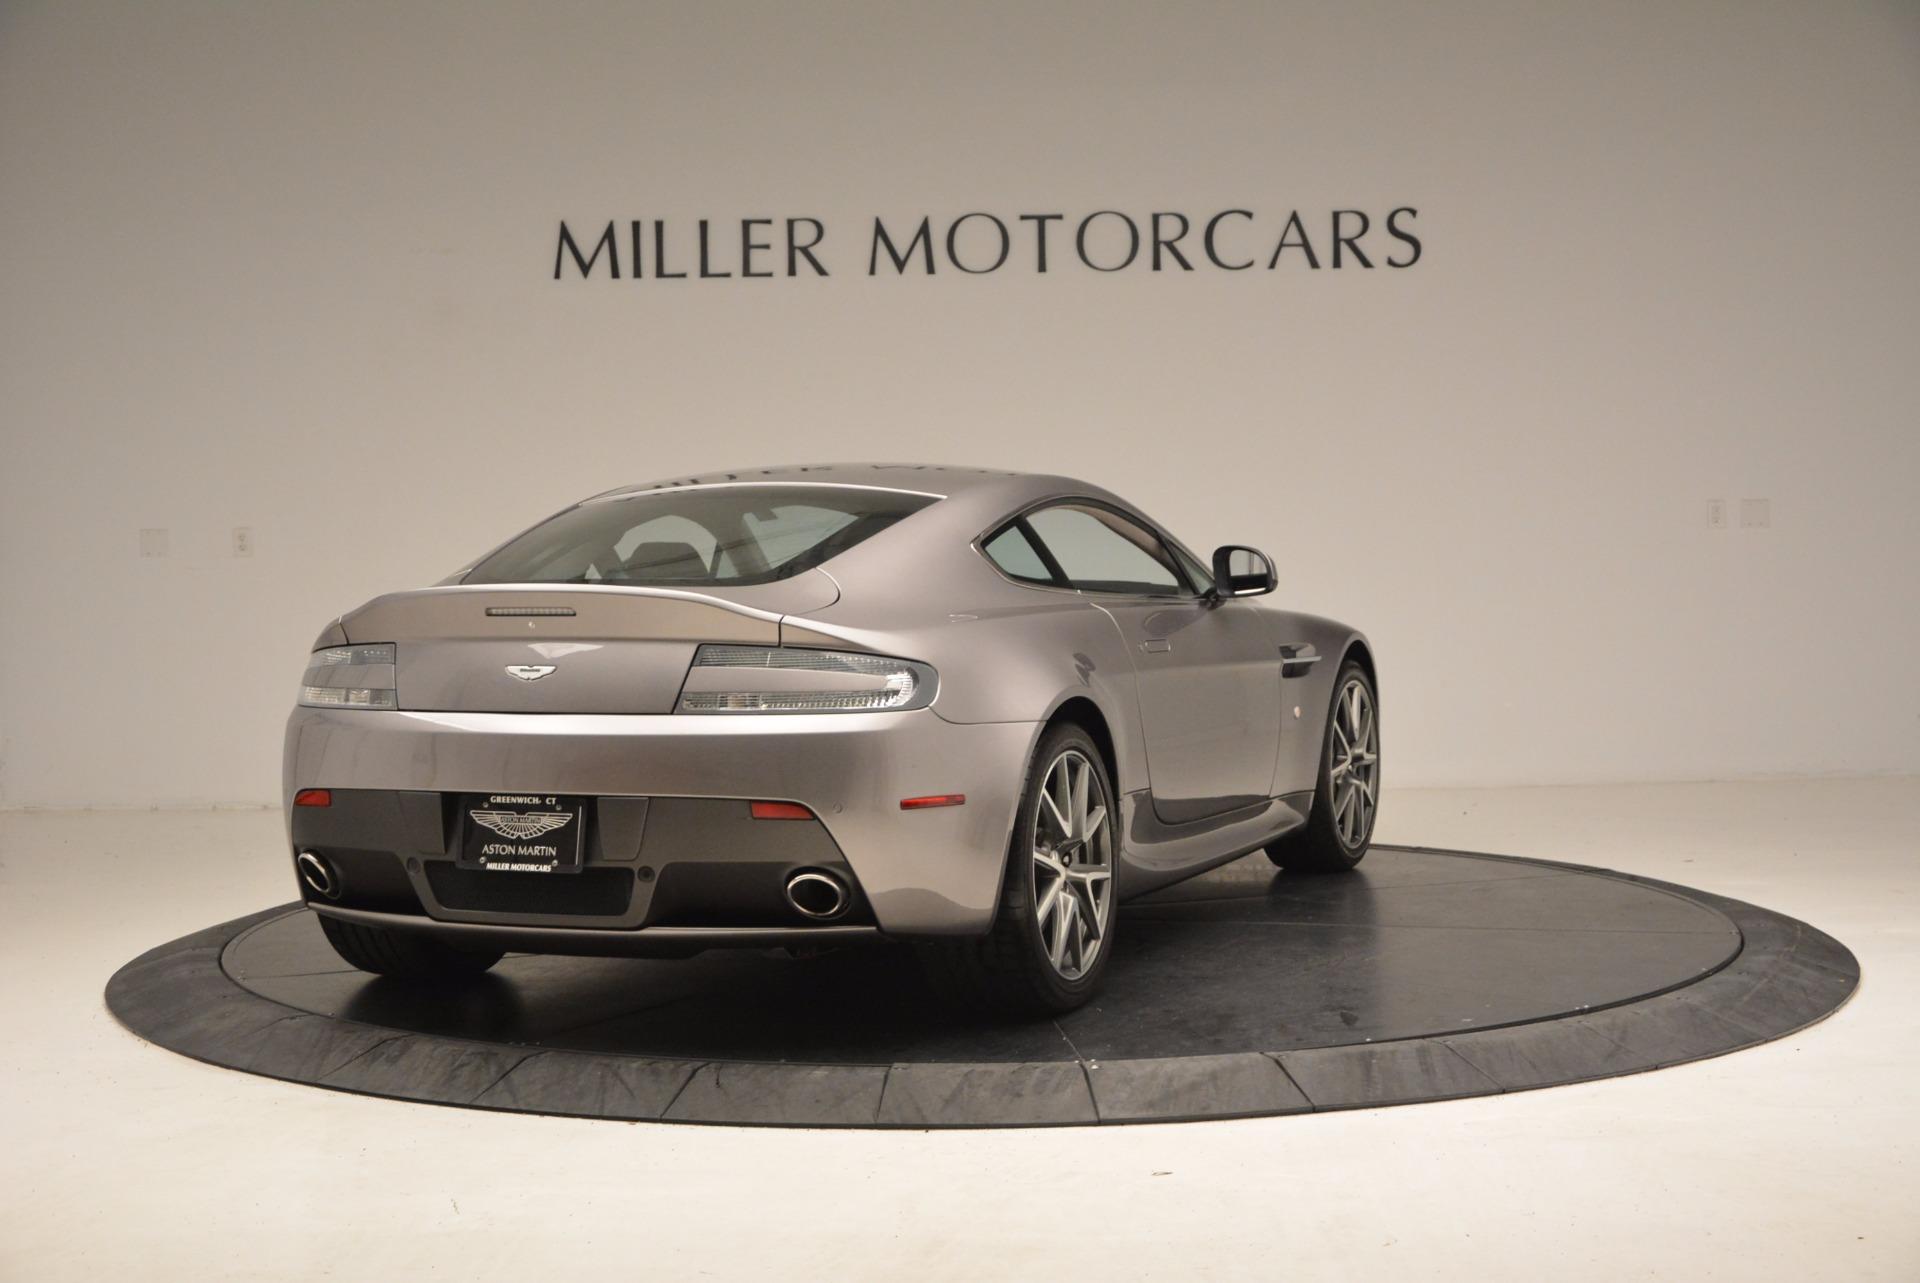 Used 2012 Aston Martin V8 Vantage  For Sale In Greenwich, CT. Alfa Romeo of Greenwich, 7263 1497_p7